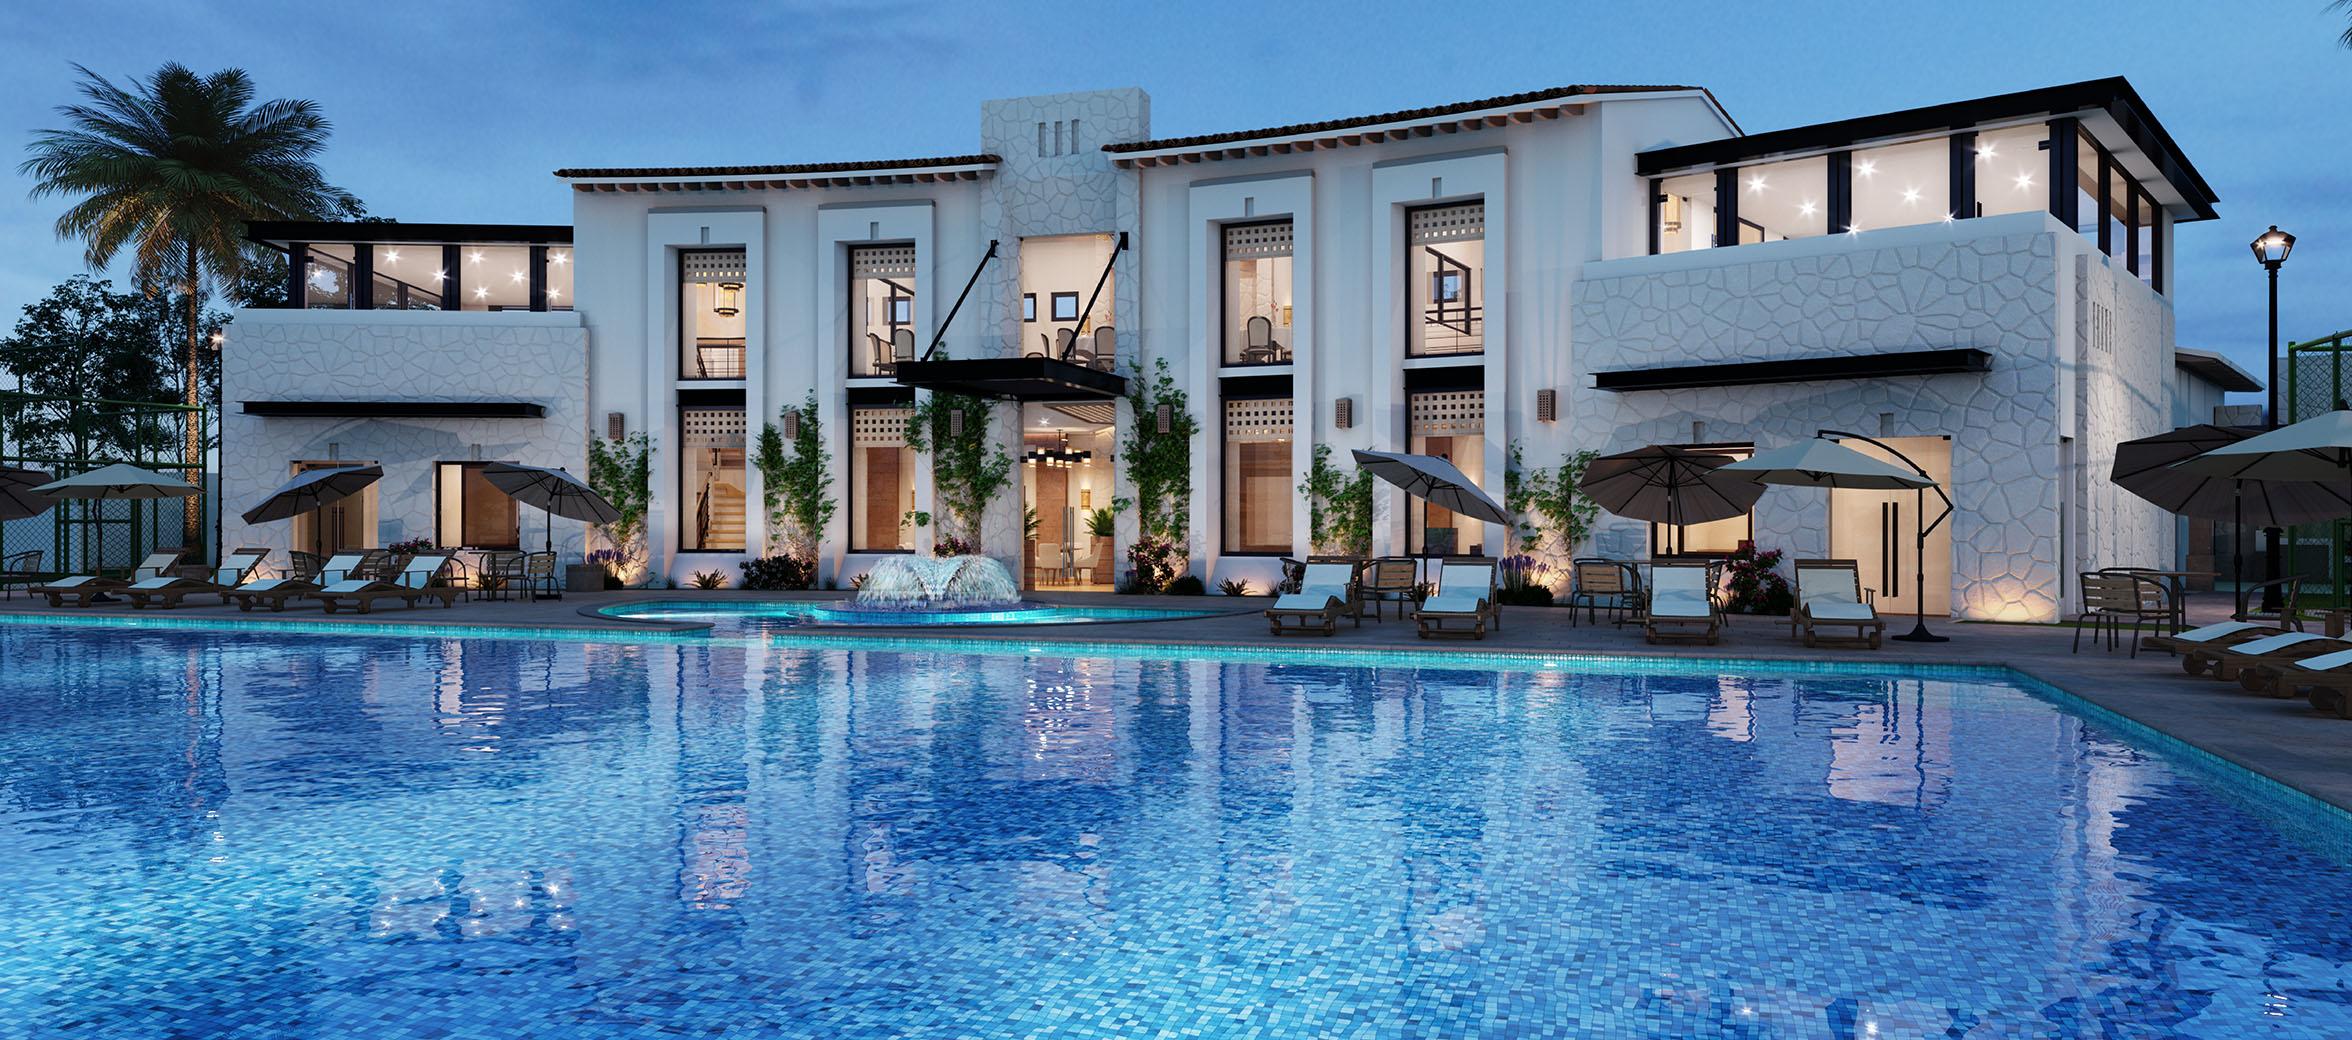 AUSTRALIAN H1 2019 HOTEL MARKET